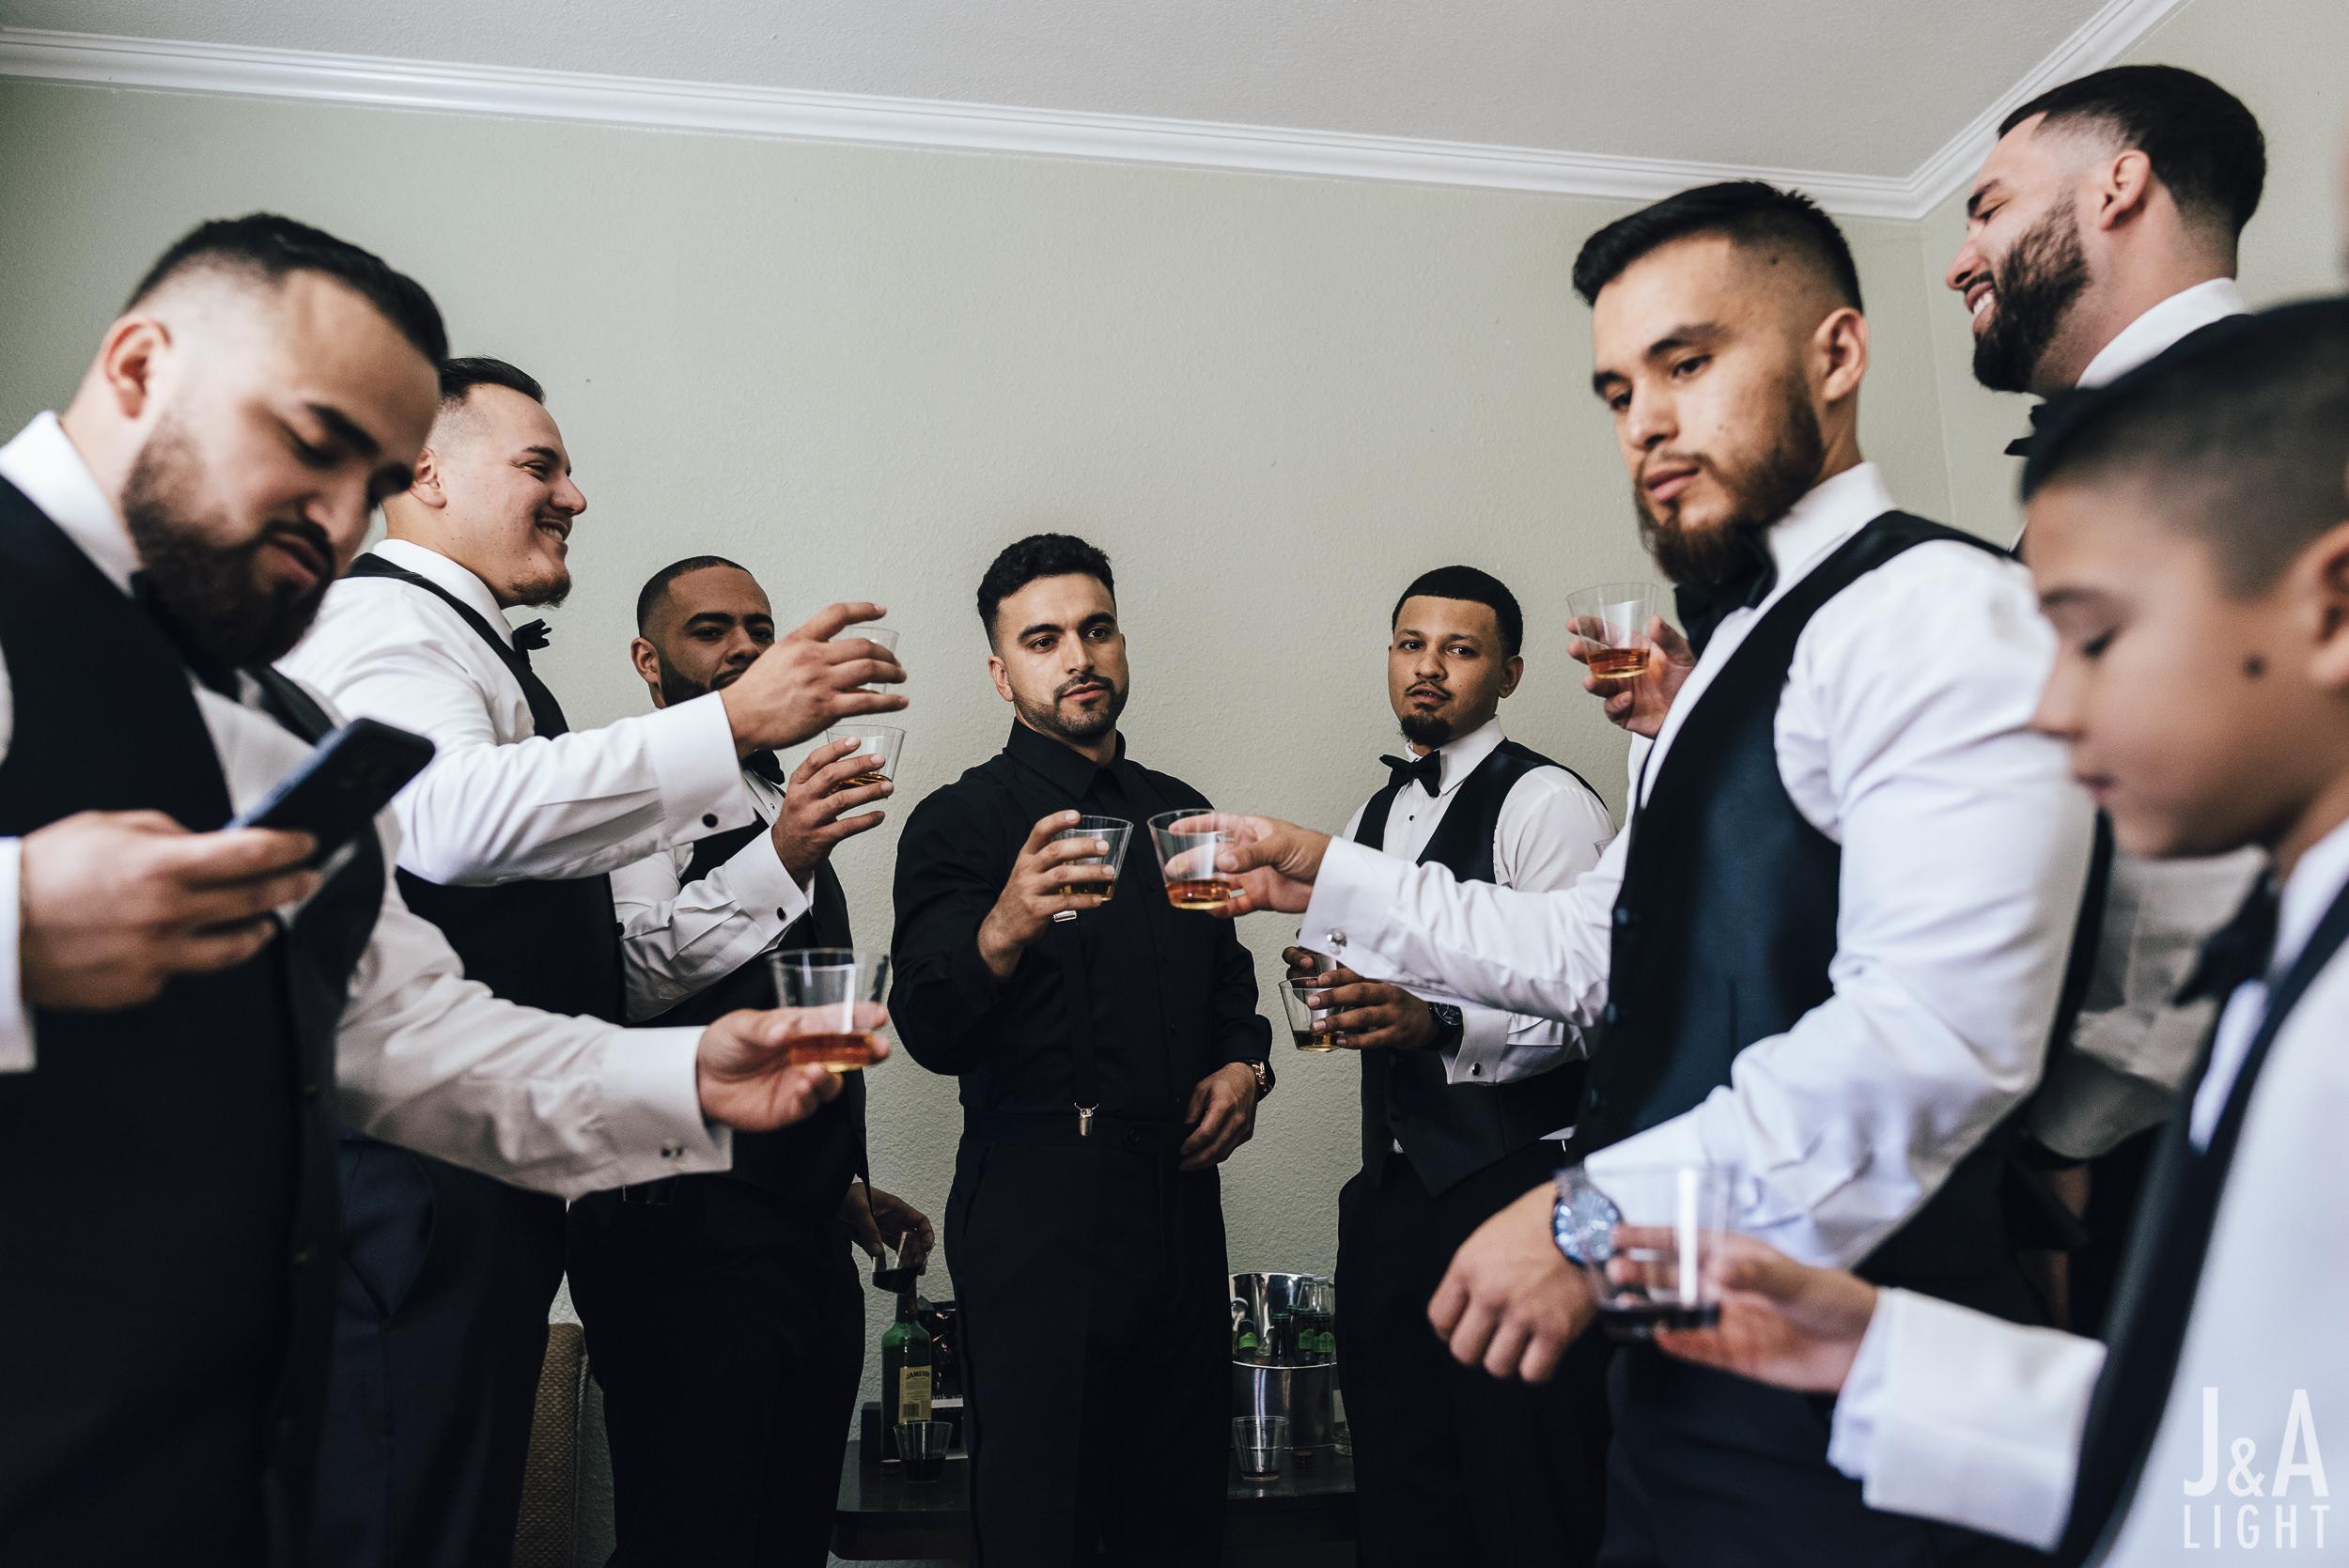 20171014-JanDan-LosBanos-GlassMansion-Wedding-Blog-009.jpg